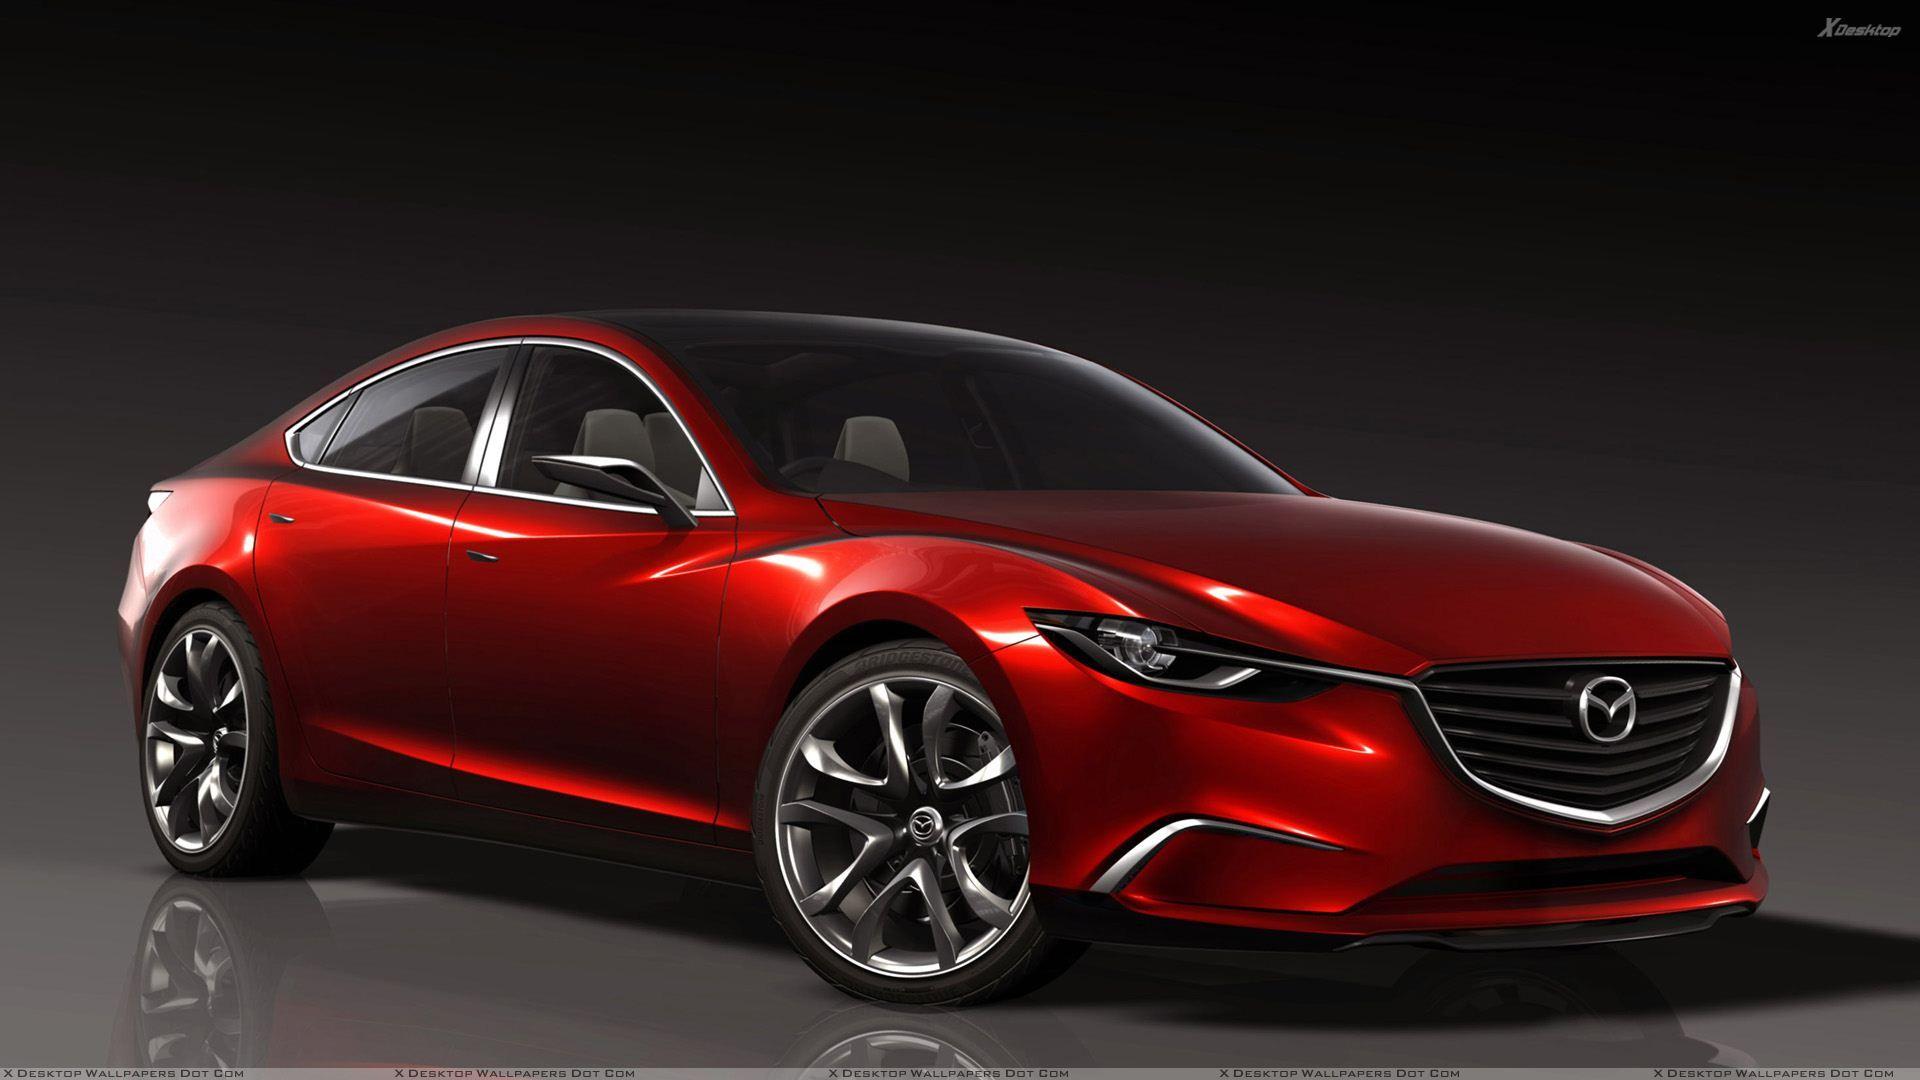 Mazda wallpaper image